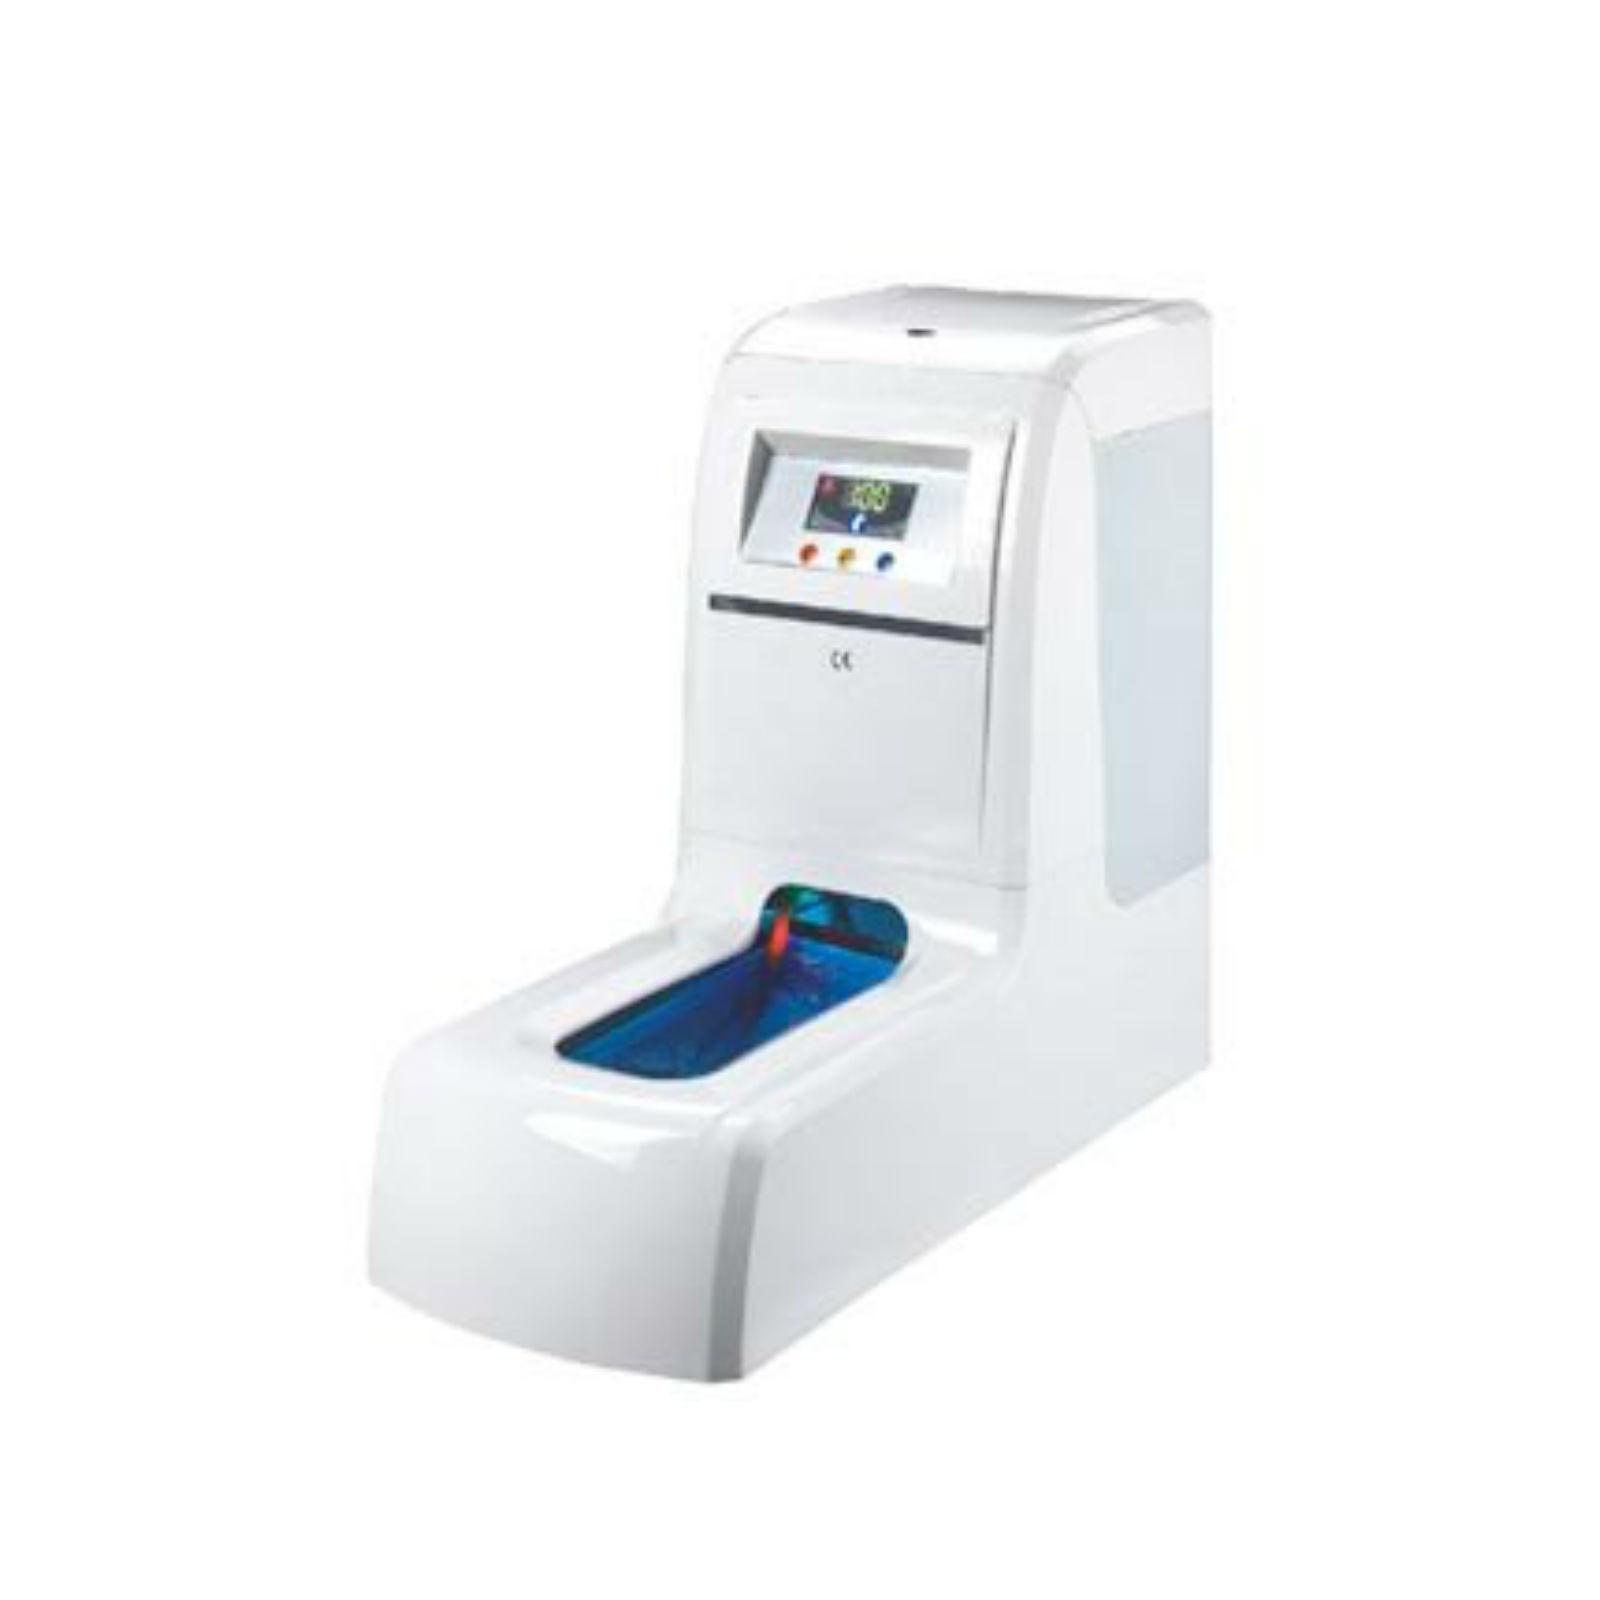 Automatic Salt Dispenser ~ Shoe cover dispenser escd stationery items wholesale